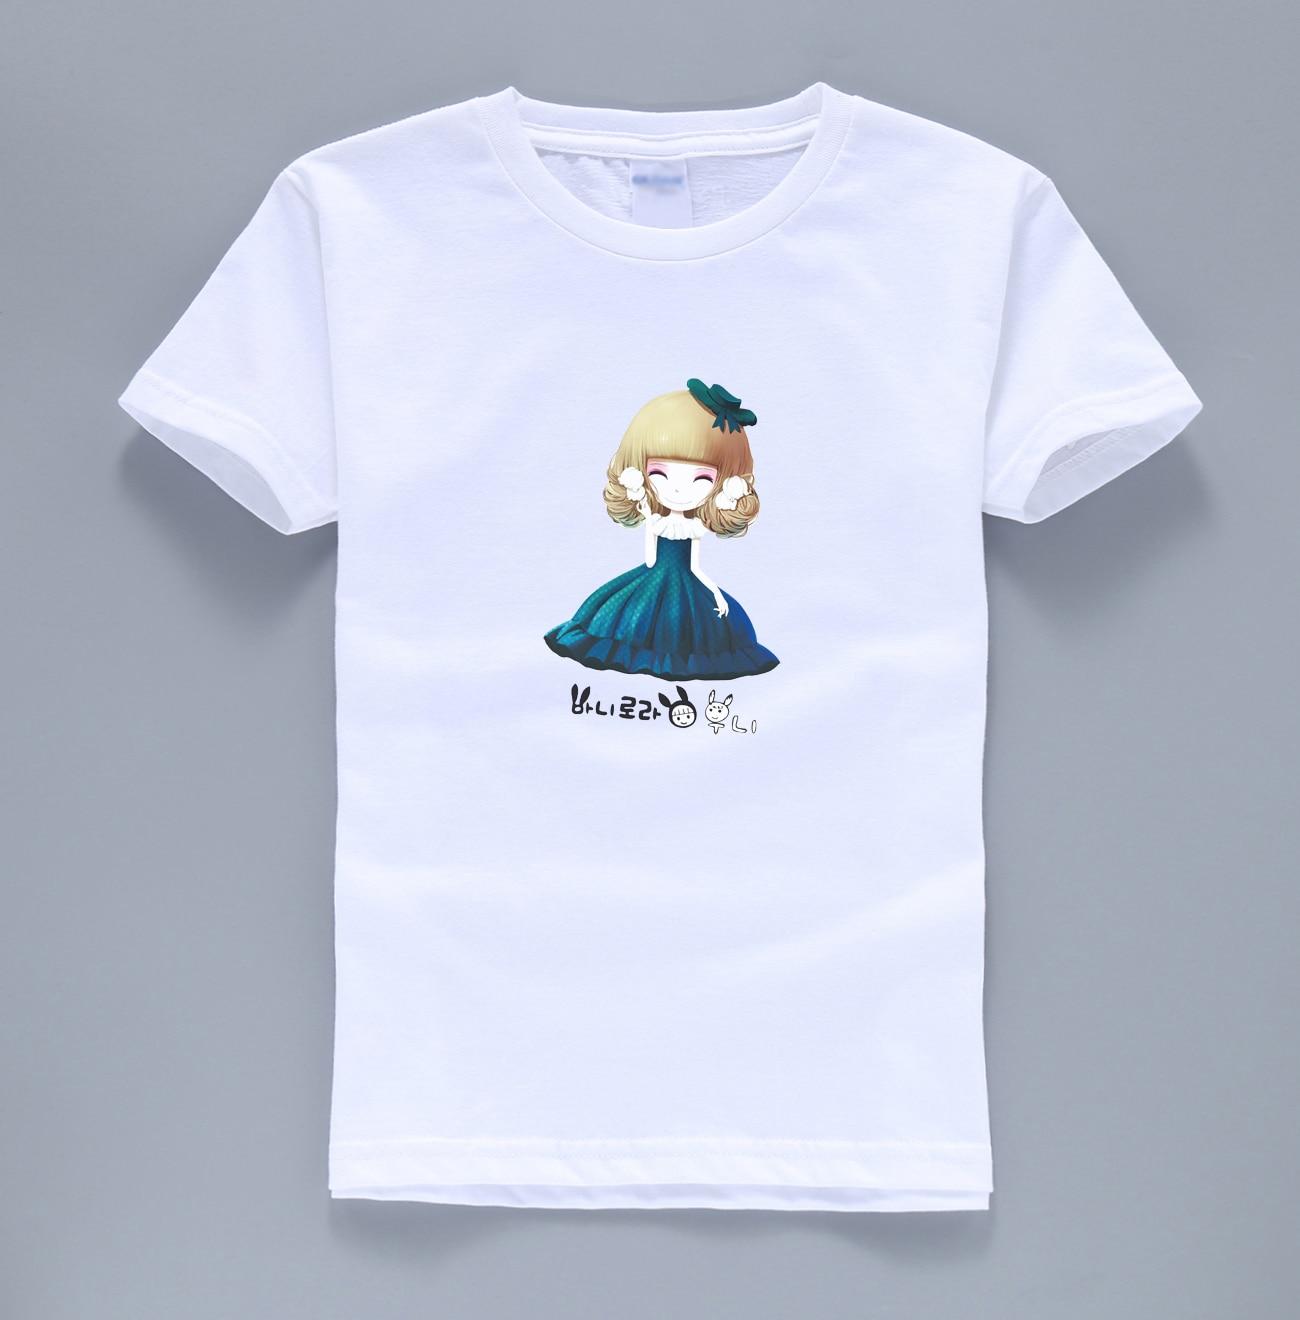 2017 summer girls tops t shirts brand cute kawaii streetwear homme kids shirts funny short sleeve o neck color children t-shirts